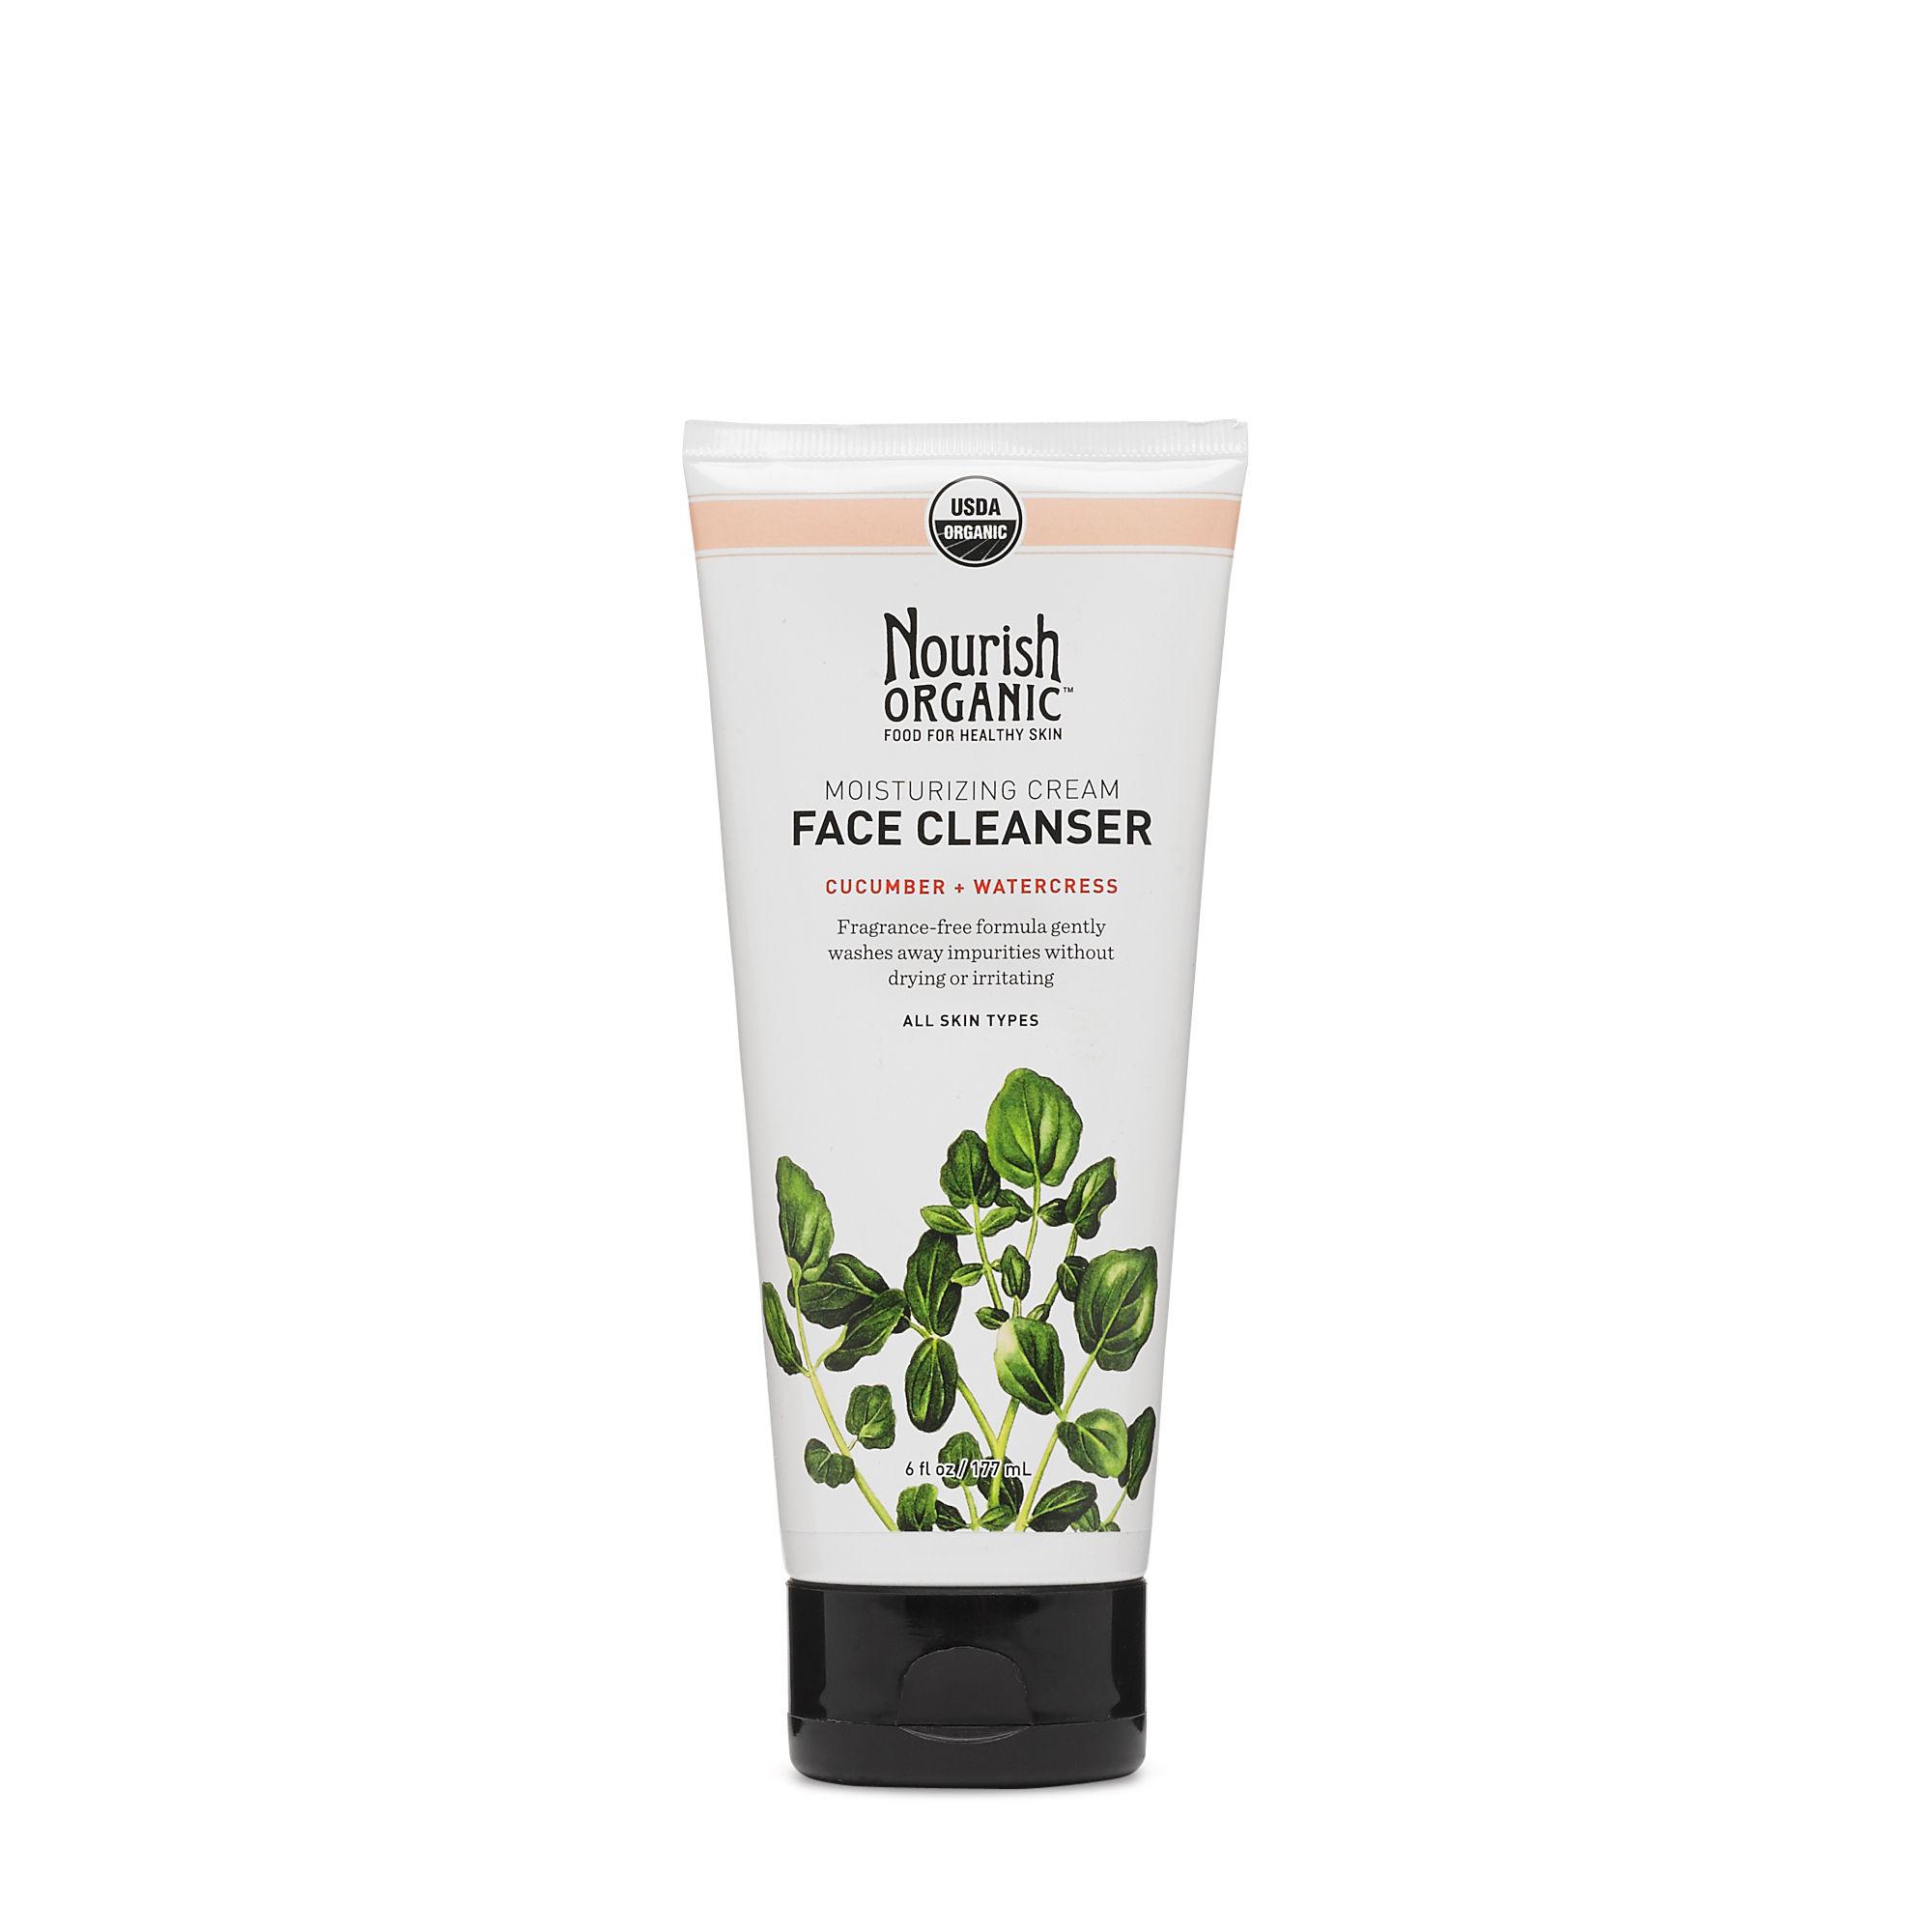 Nourish Organic Moisturizing Cream cleanser // $15 - Good For: All skin typesAnti-oxidant rich, gentle, fragrance free